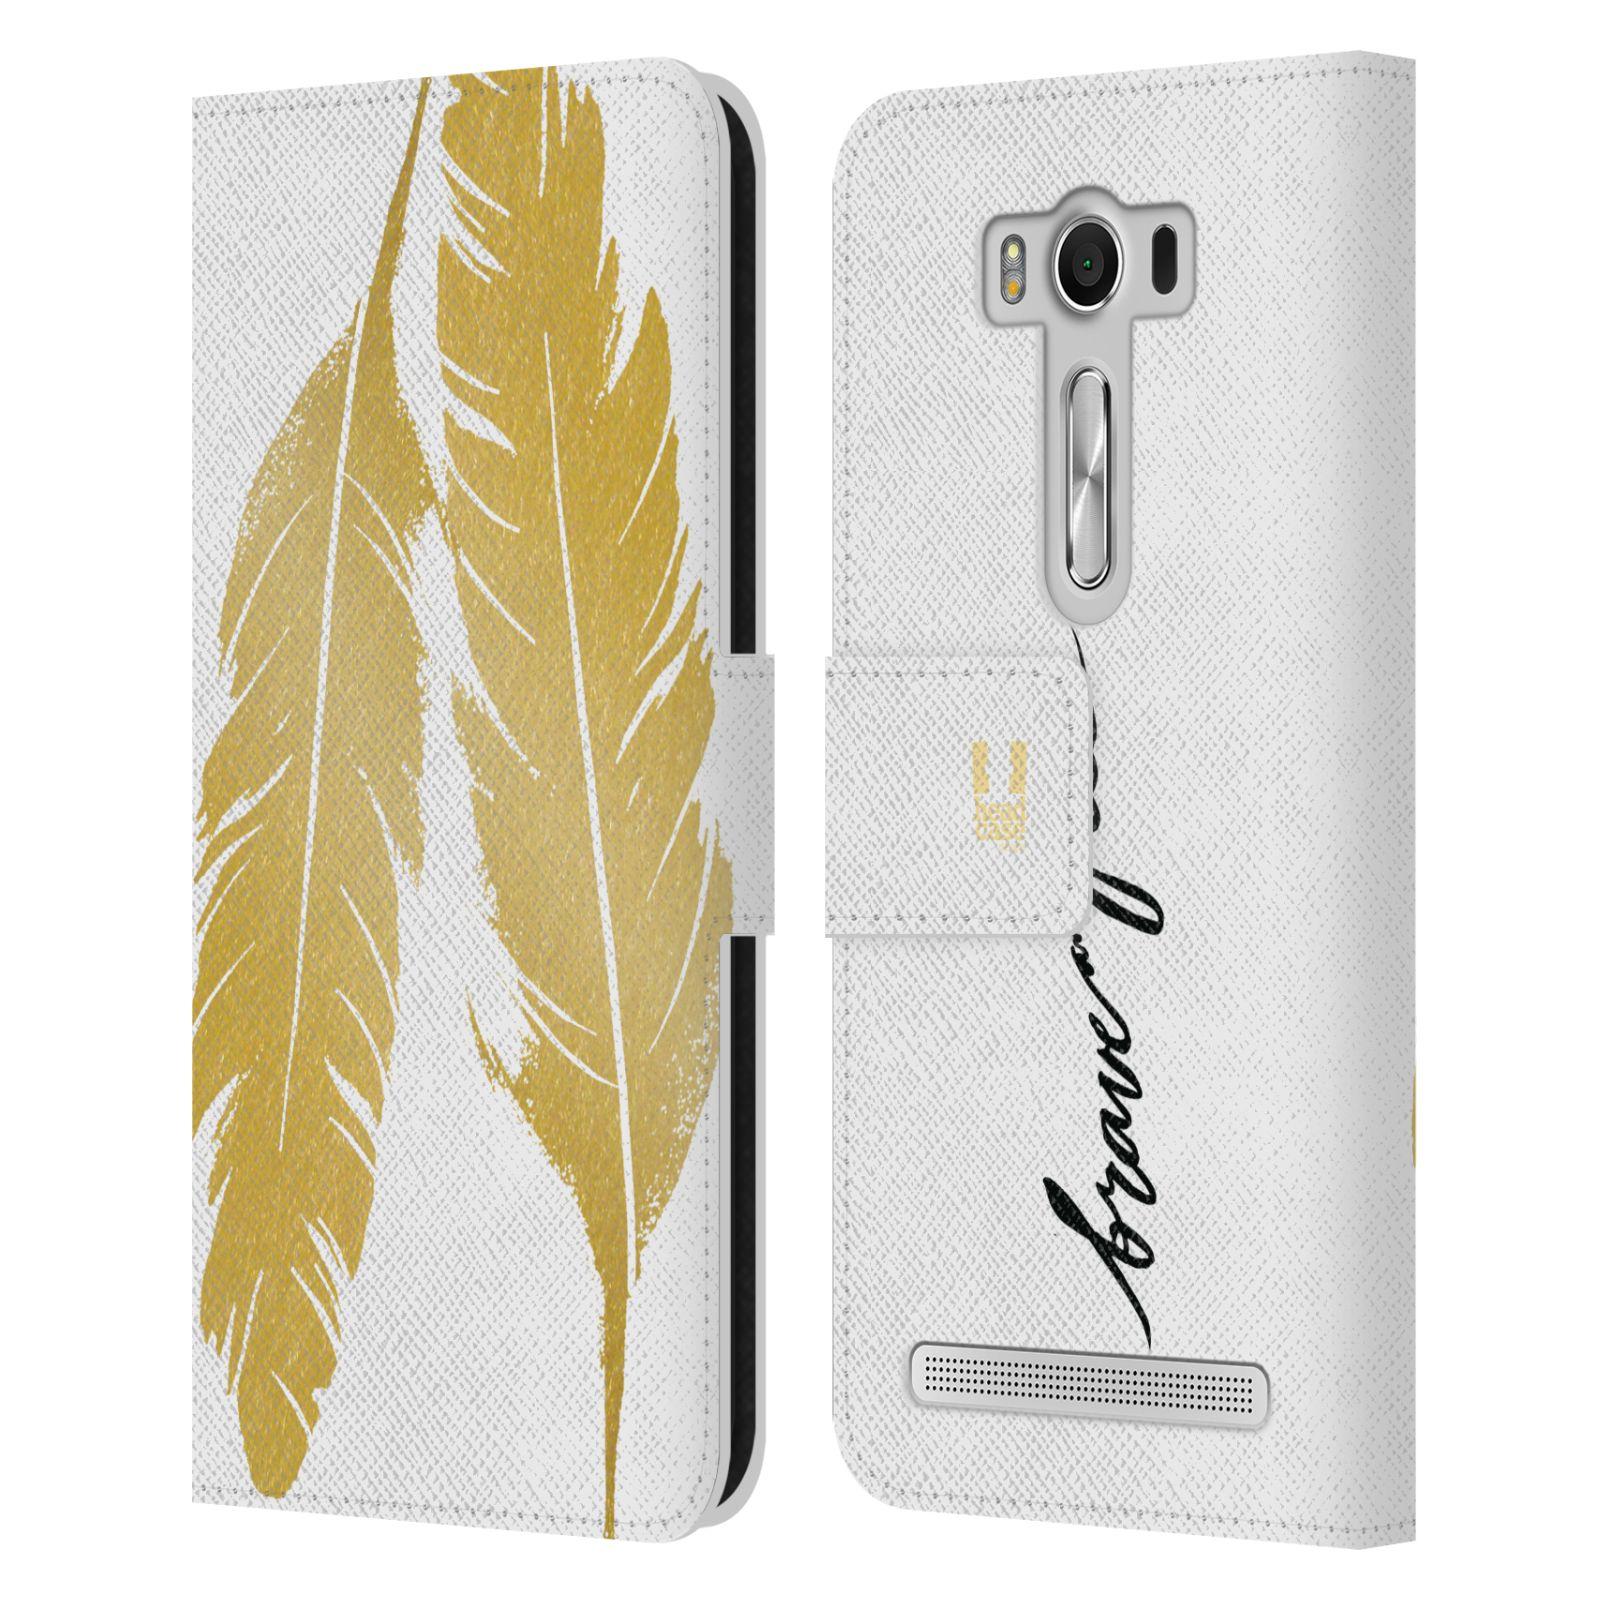 Pouzdro na mobil Asus Zenfone 2 Laser ZE500KL - Head Case - Fashion zlaté pírka